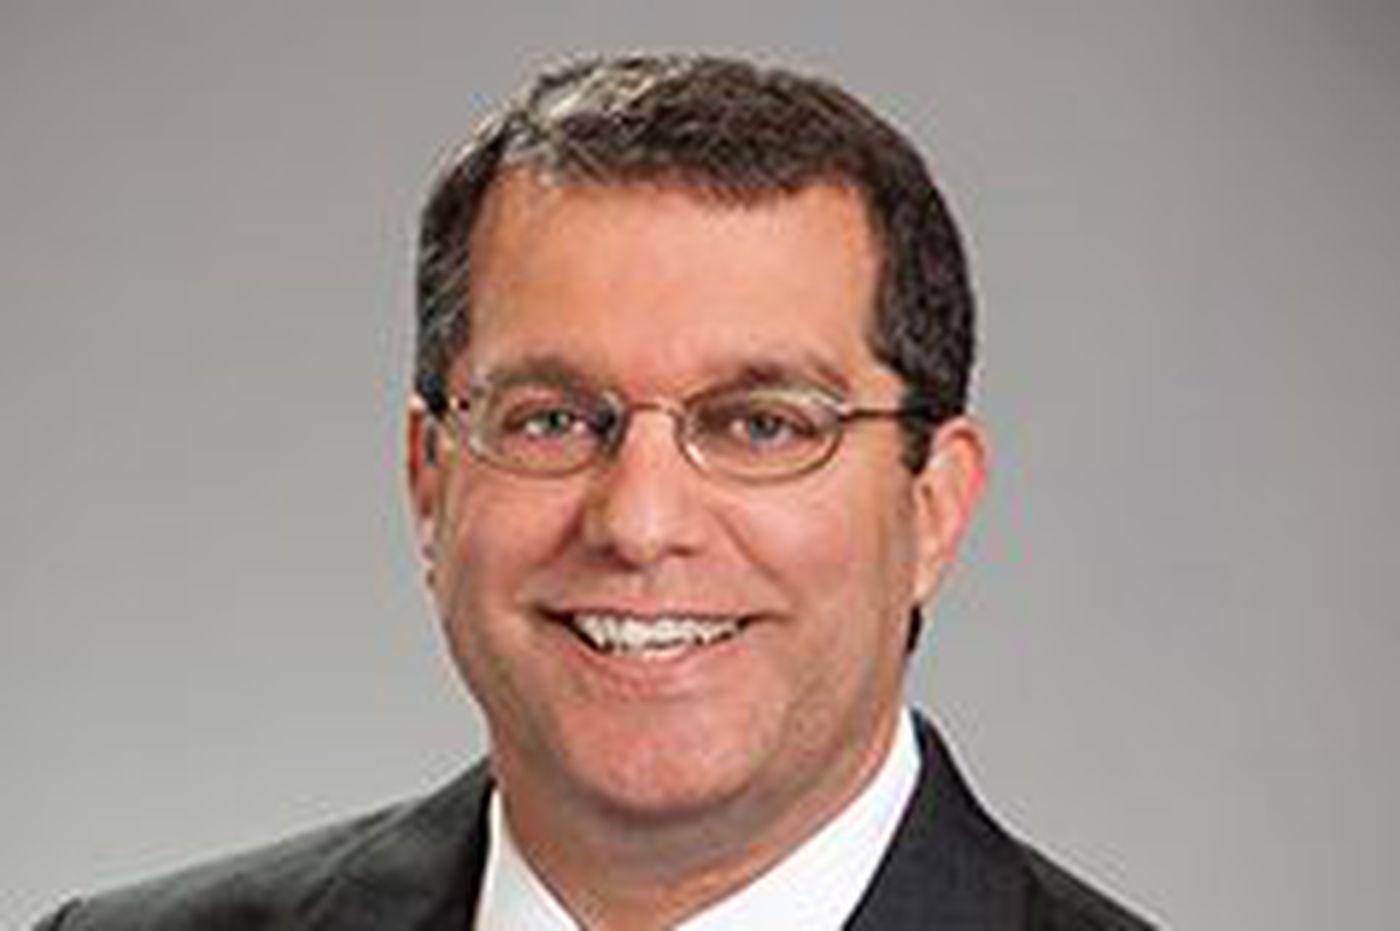 New boss Hahn running Axalta, CEO Shaver joins AkzoNobel, more deals ahead